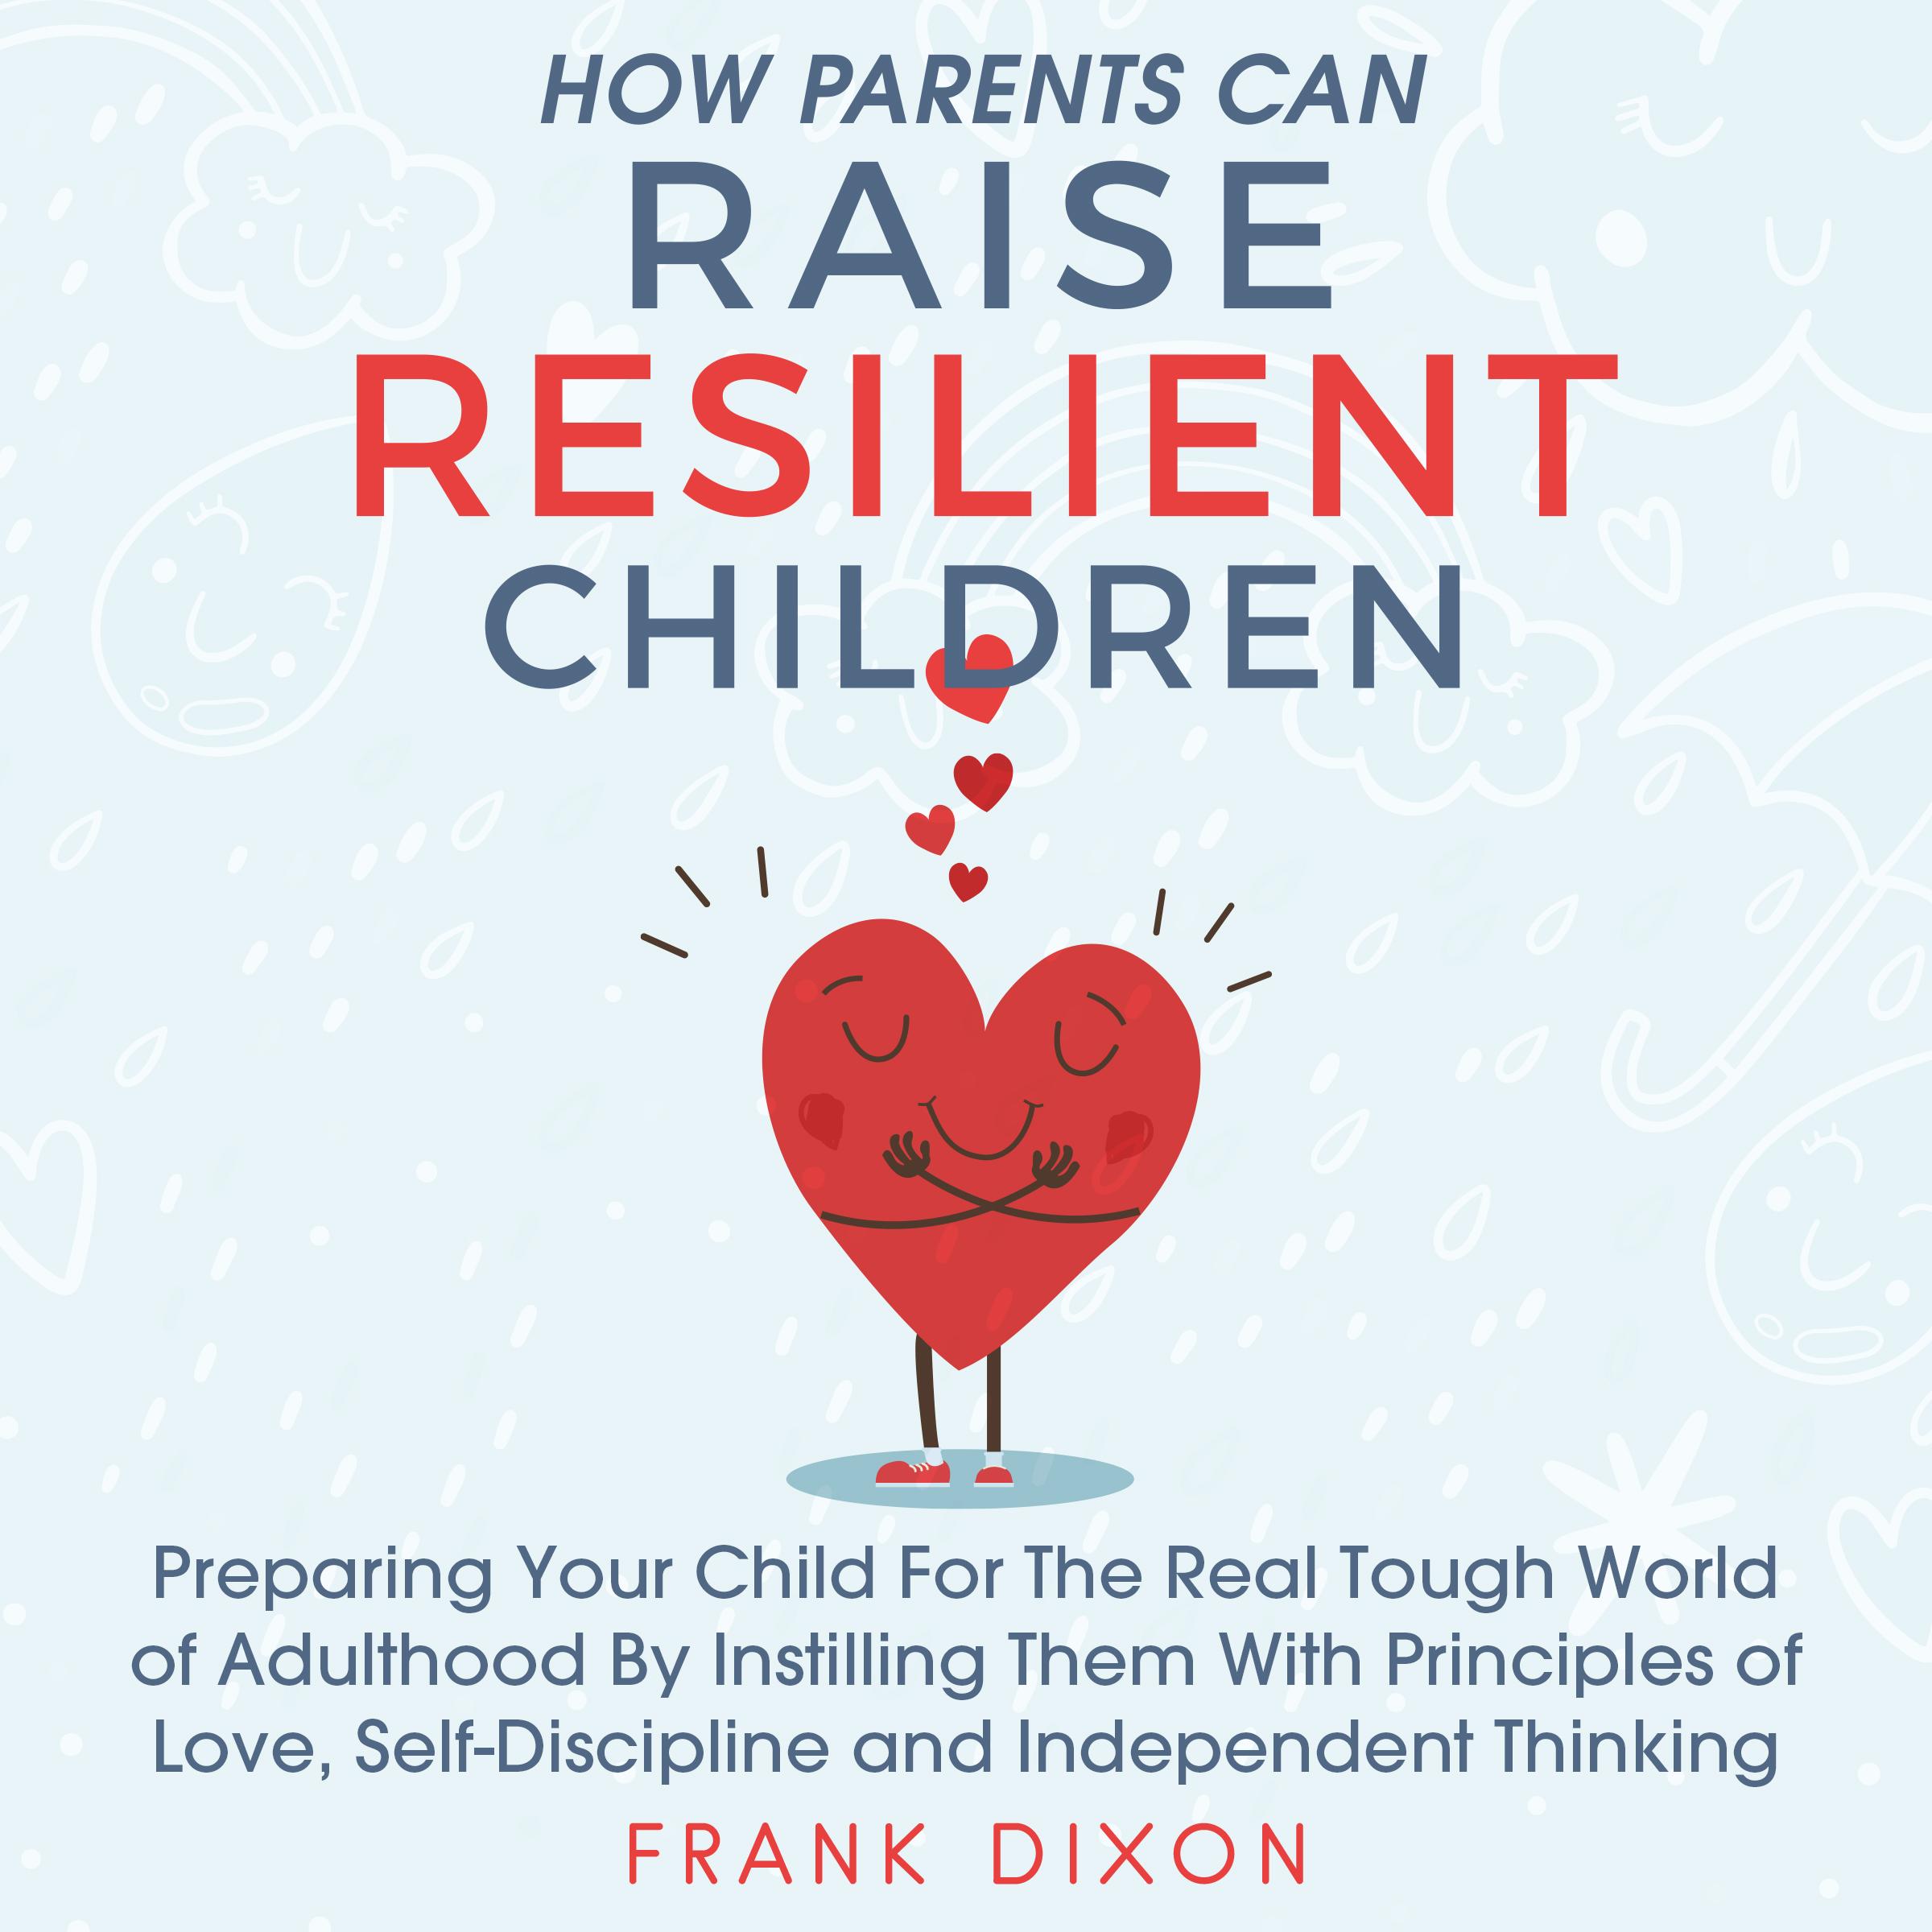 How Parents Can Raise Resilient Children ACX - Media Group